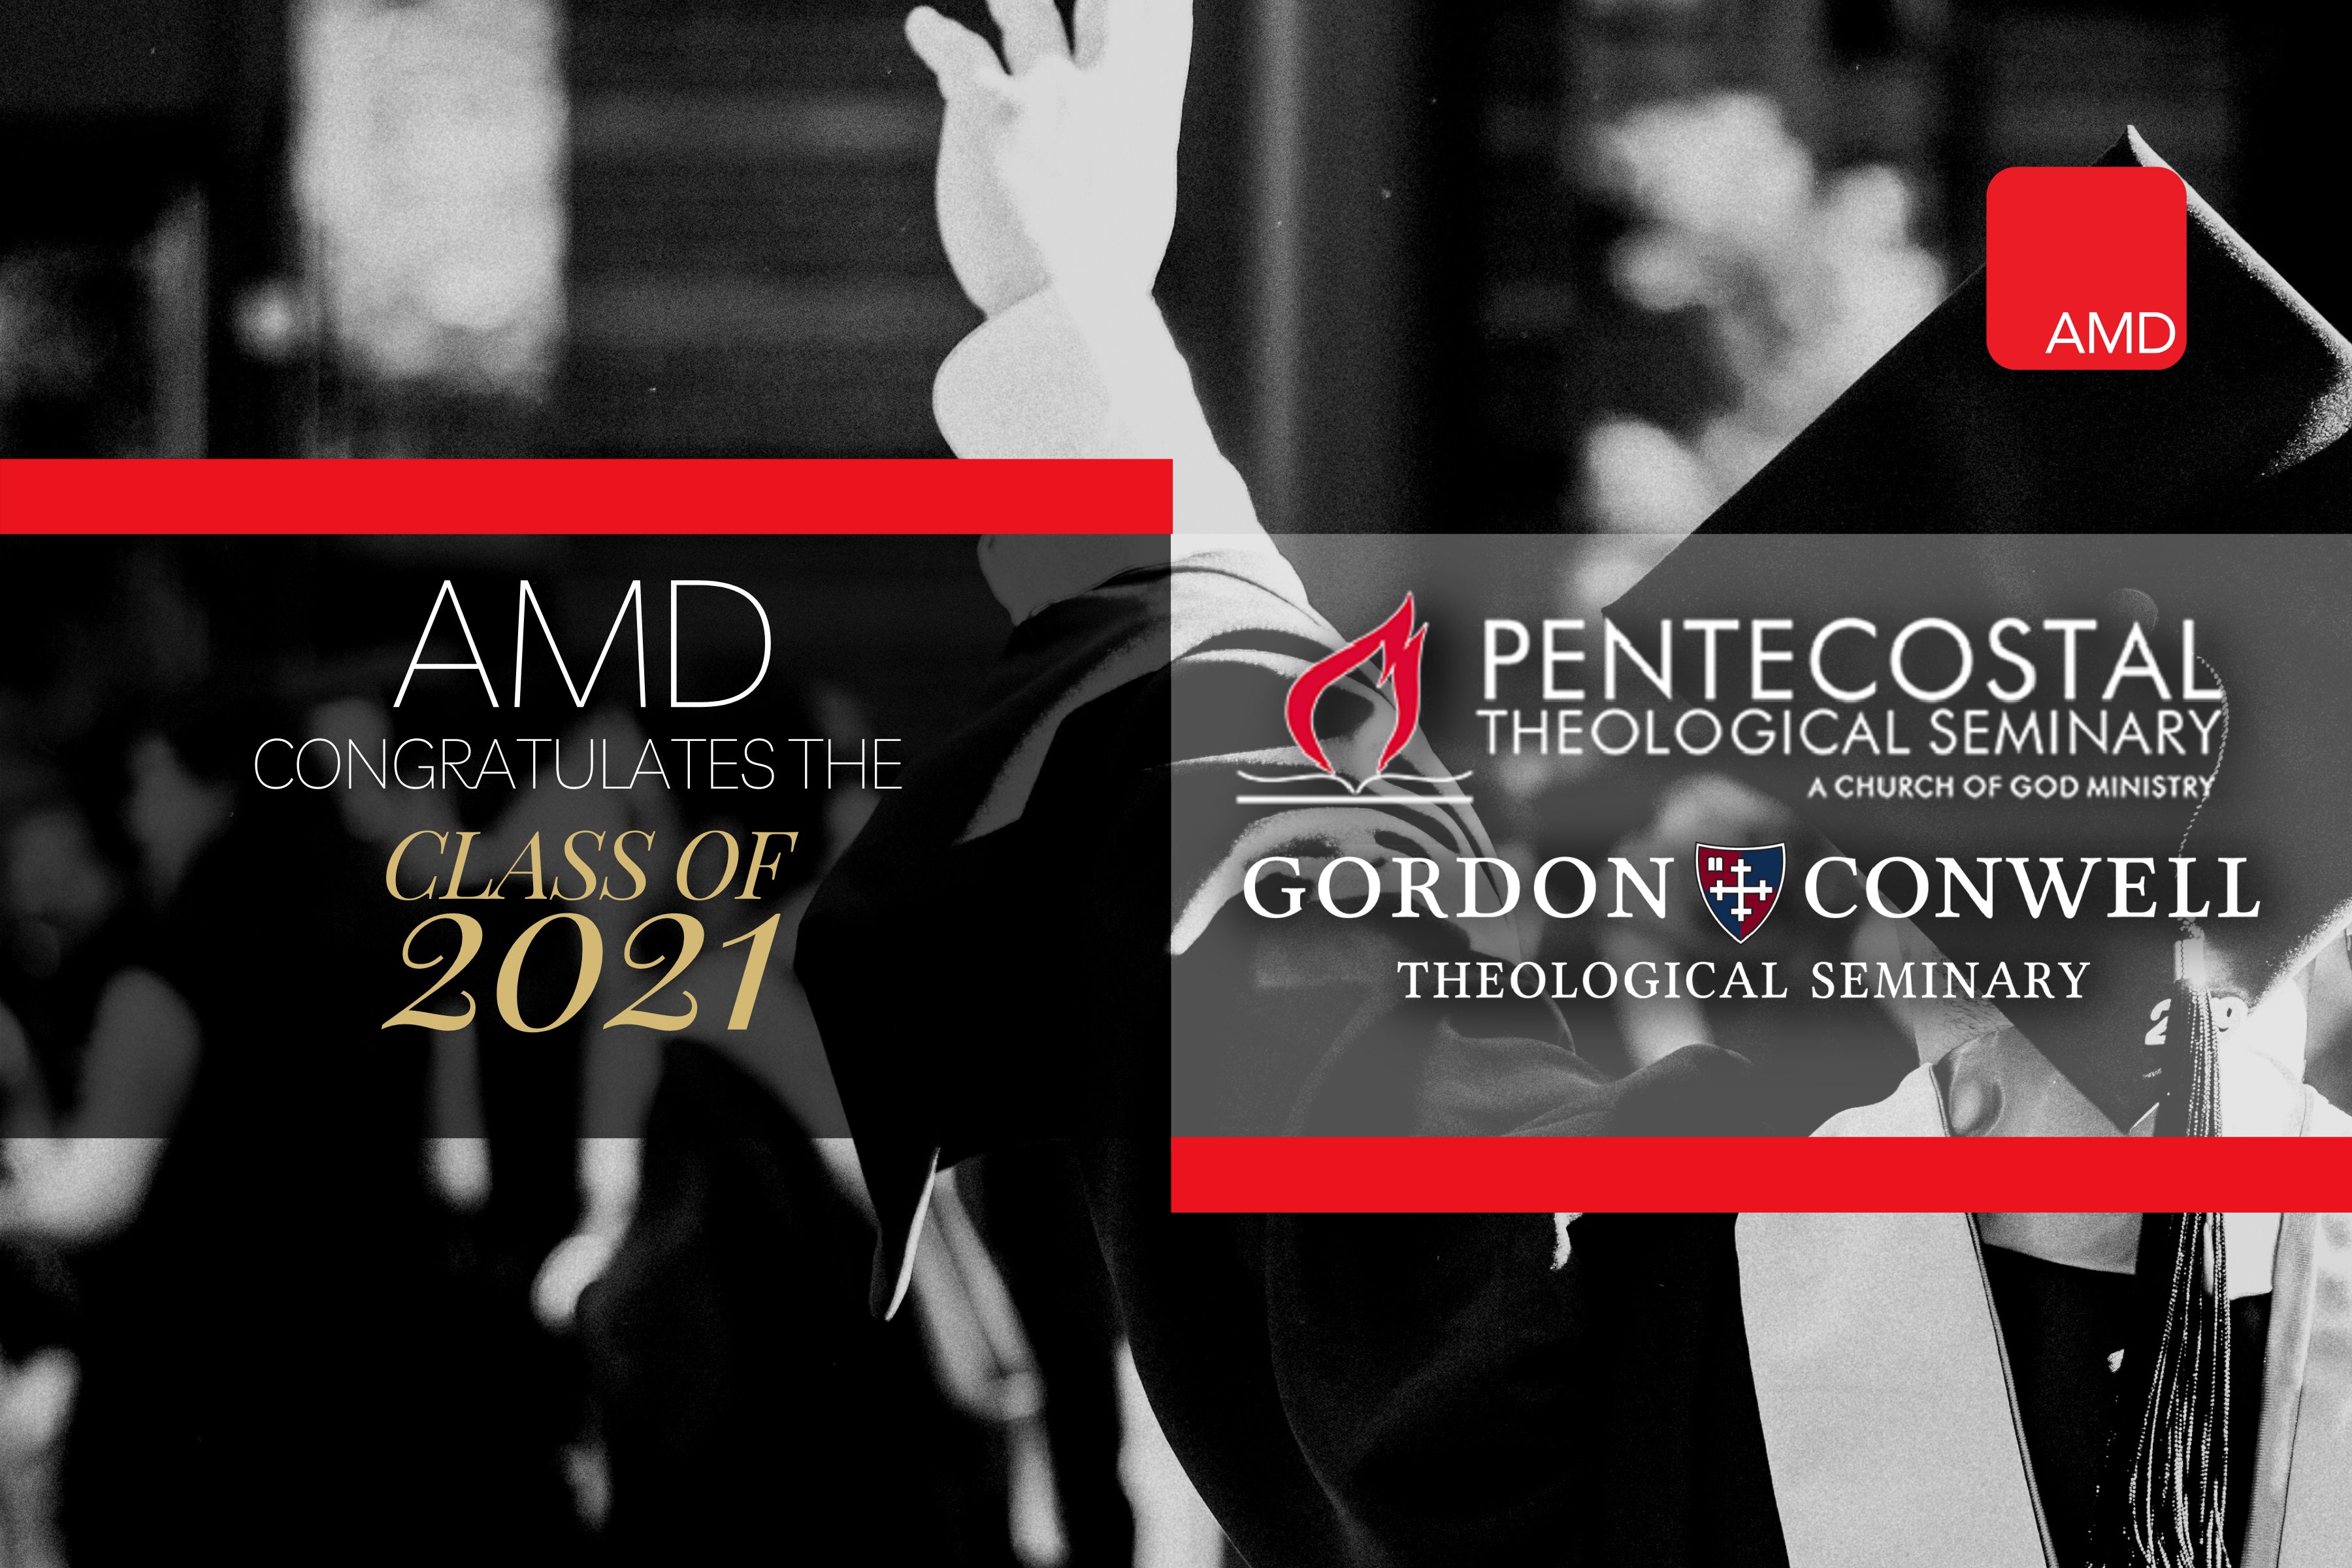 2021 Graduates of Pentecostal Theological Seminary and Gordon-Conwell Theological Seminary